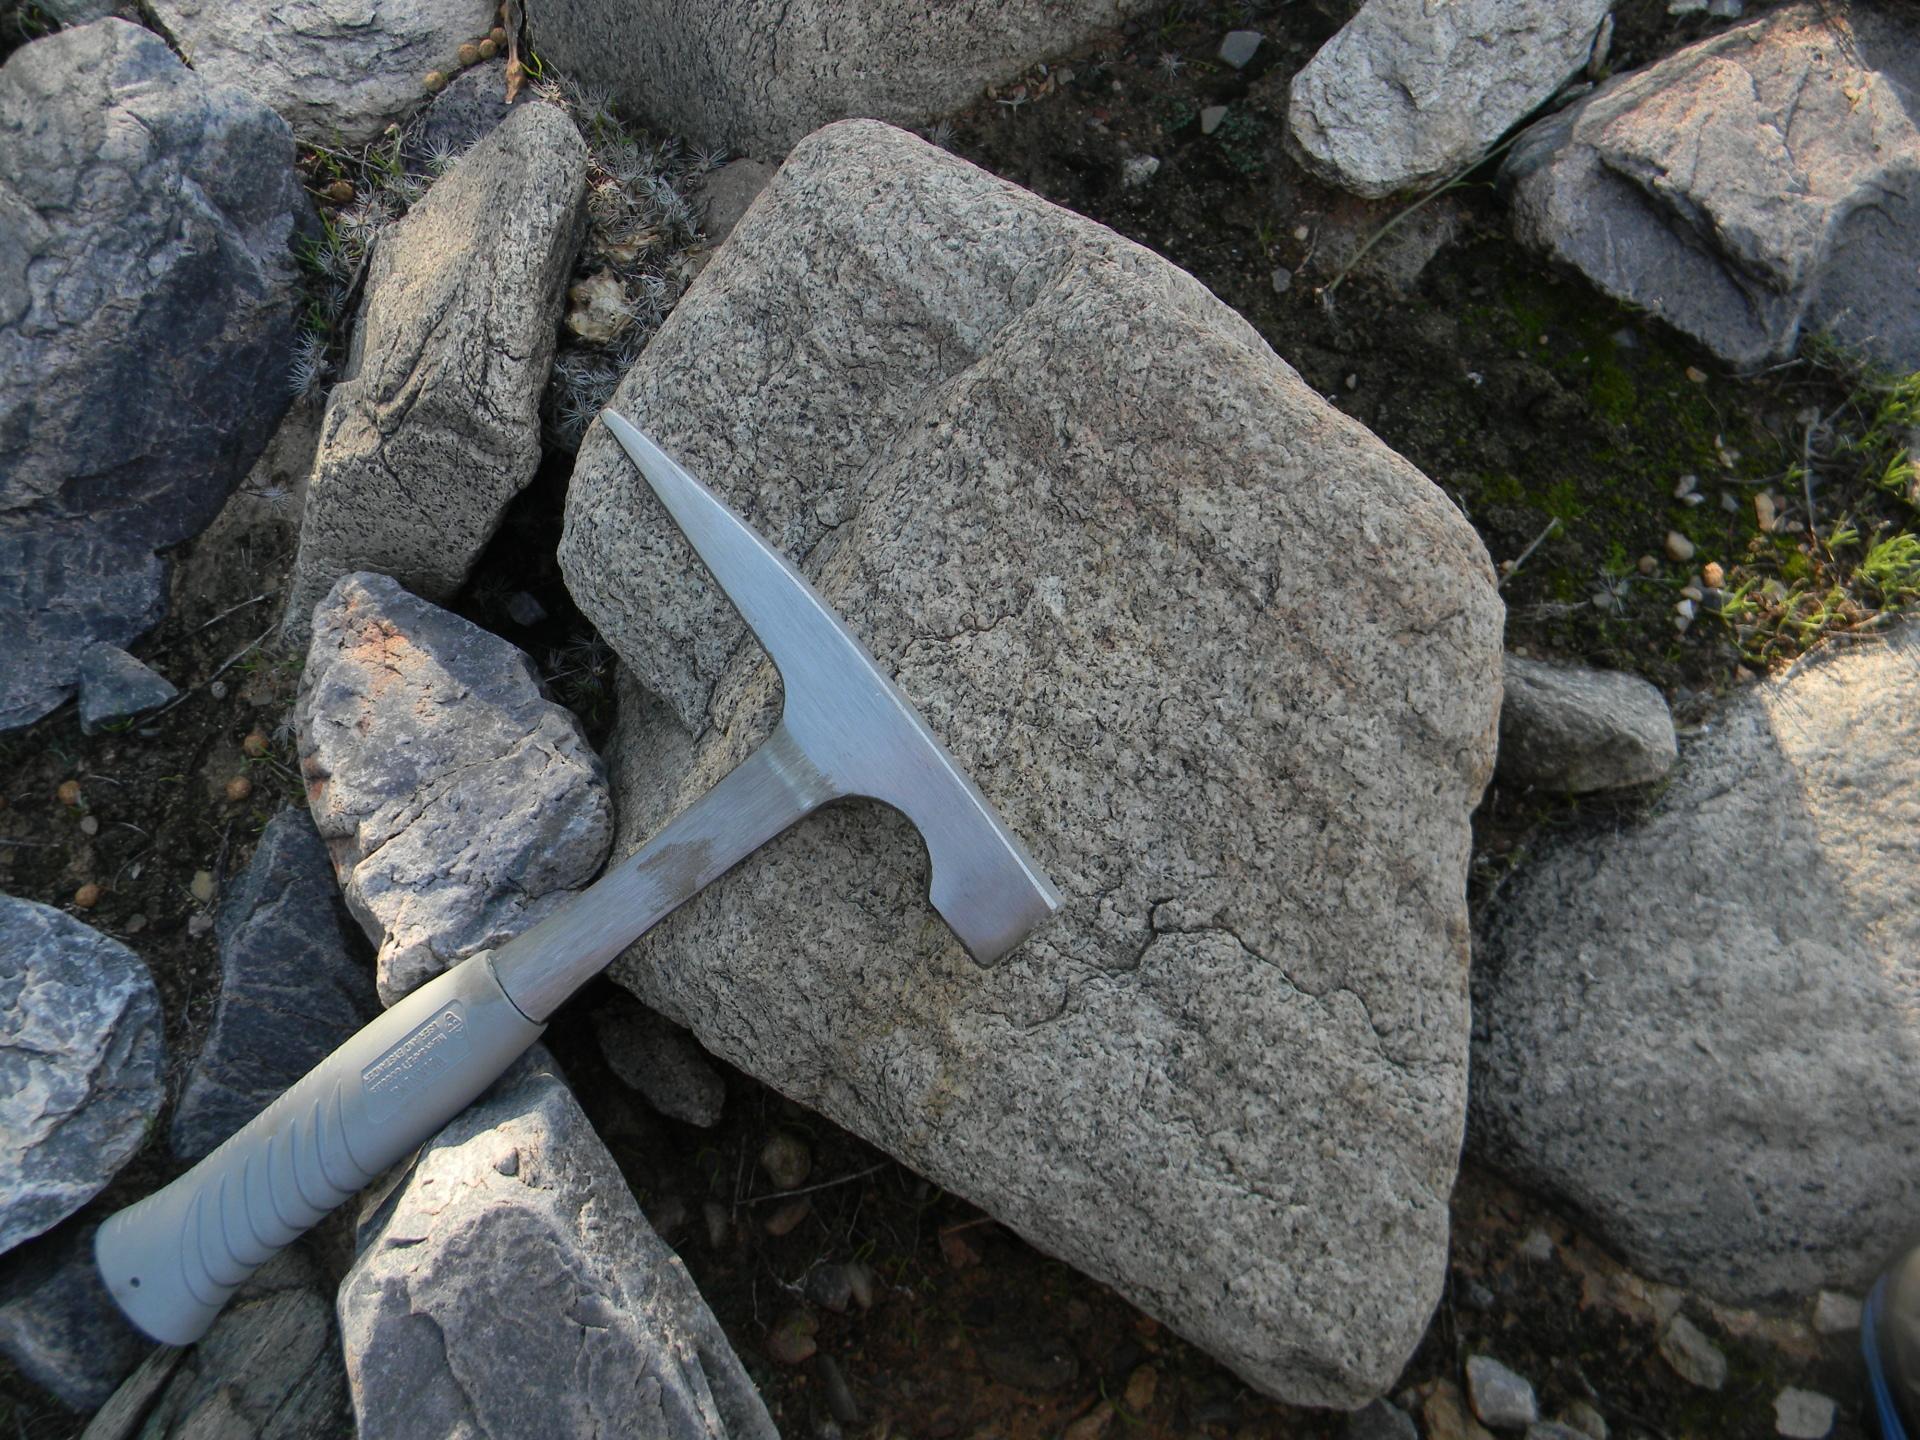 arizona mineral and rock hounding hiking